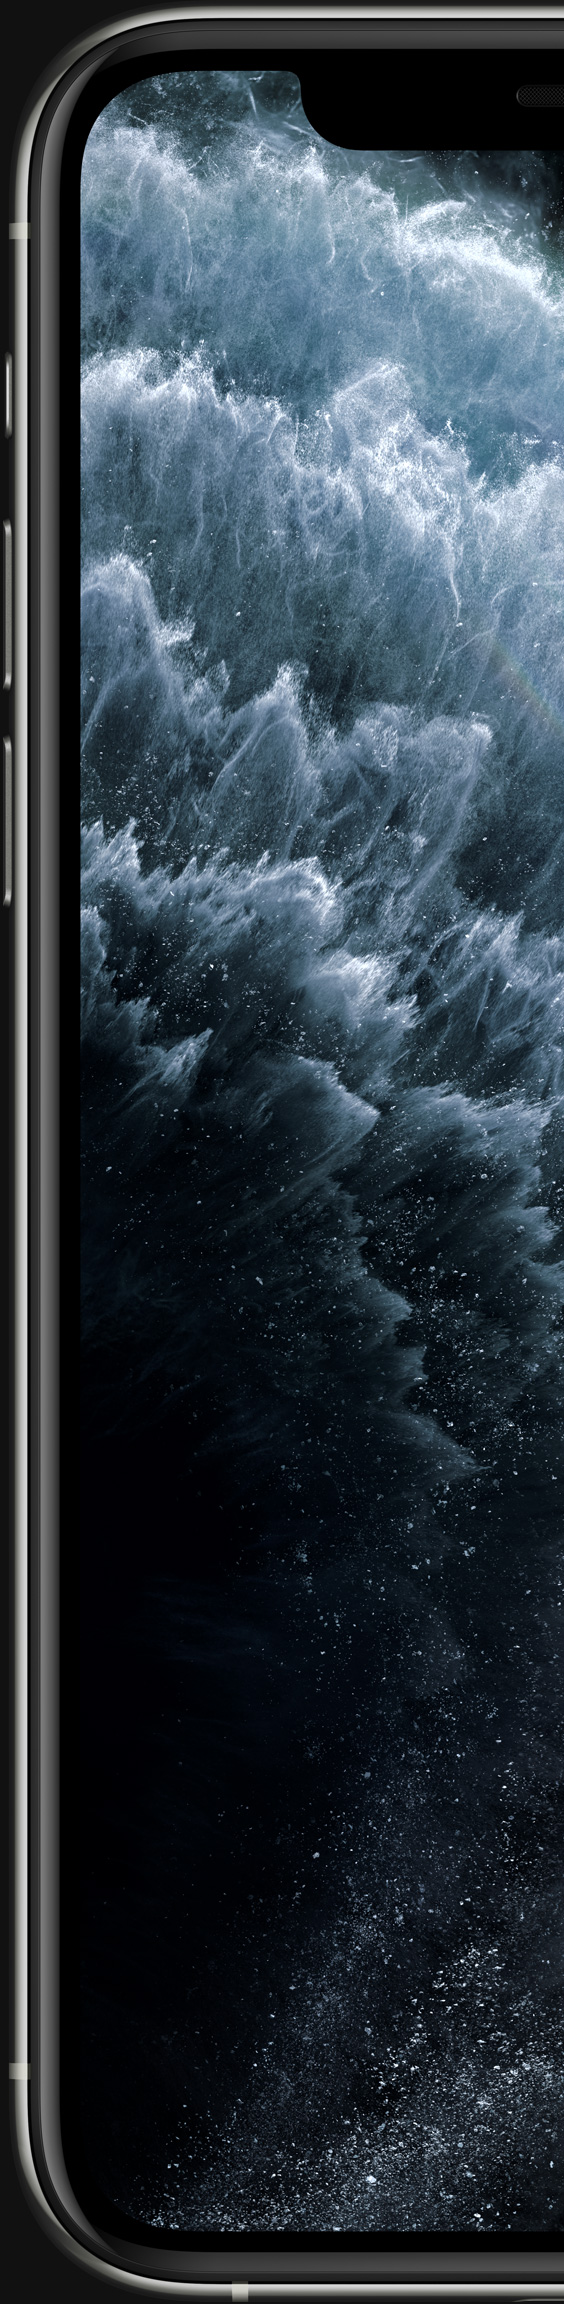 Iphone 11 Pro-6